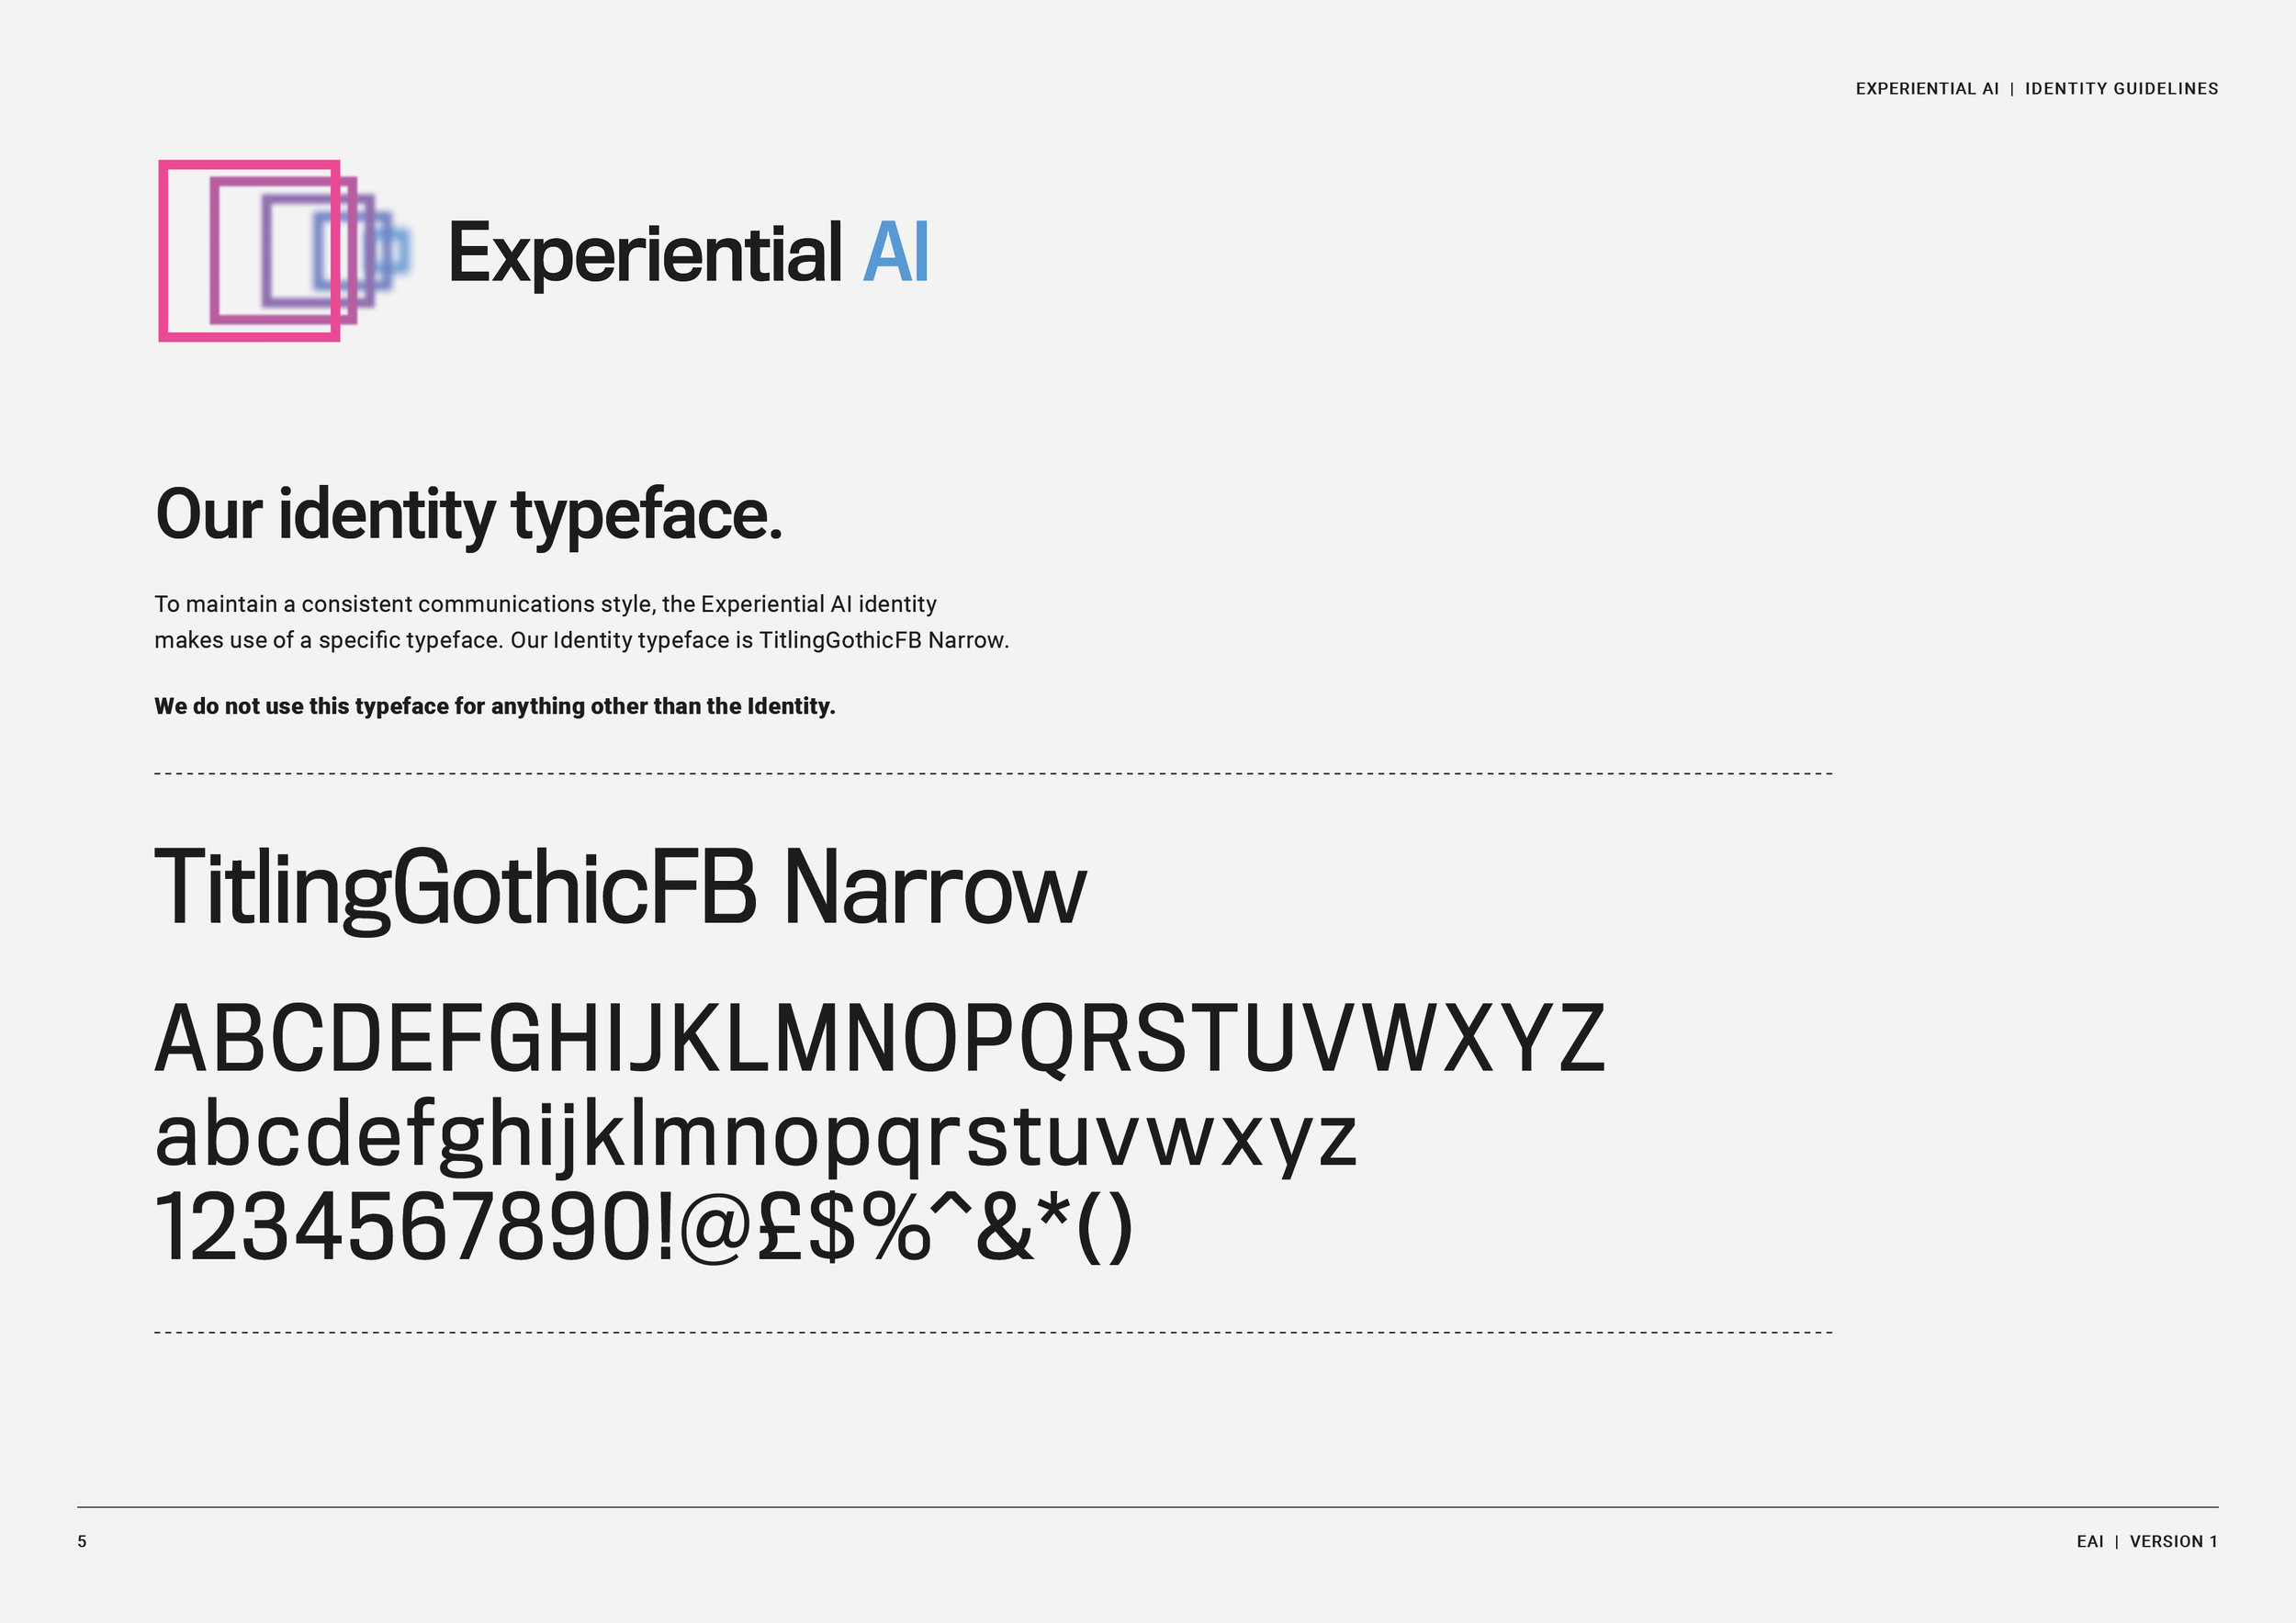 EAI_Identity_Guidelines5.jpg